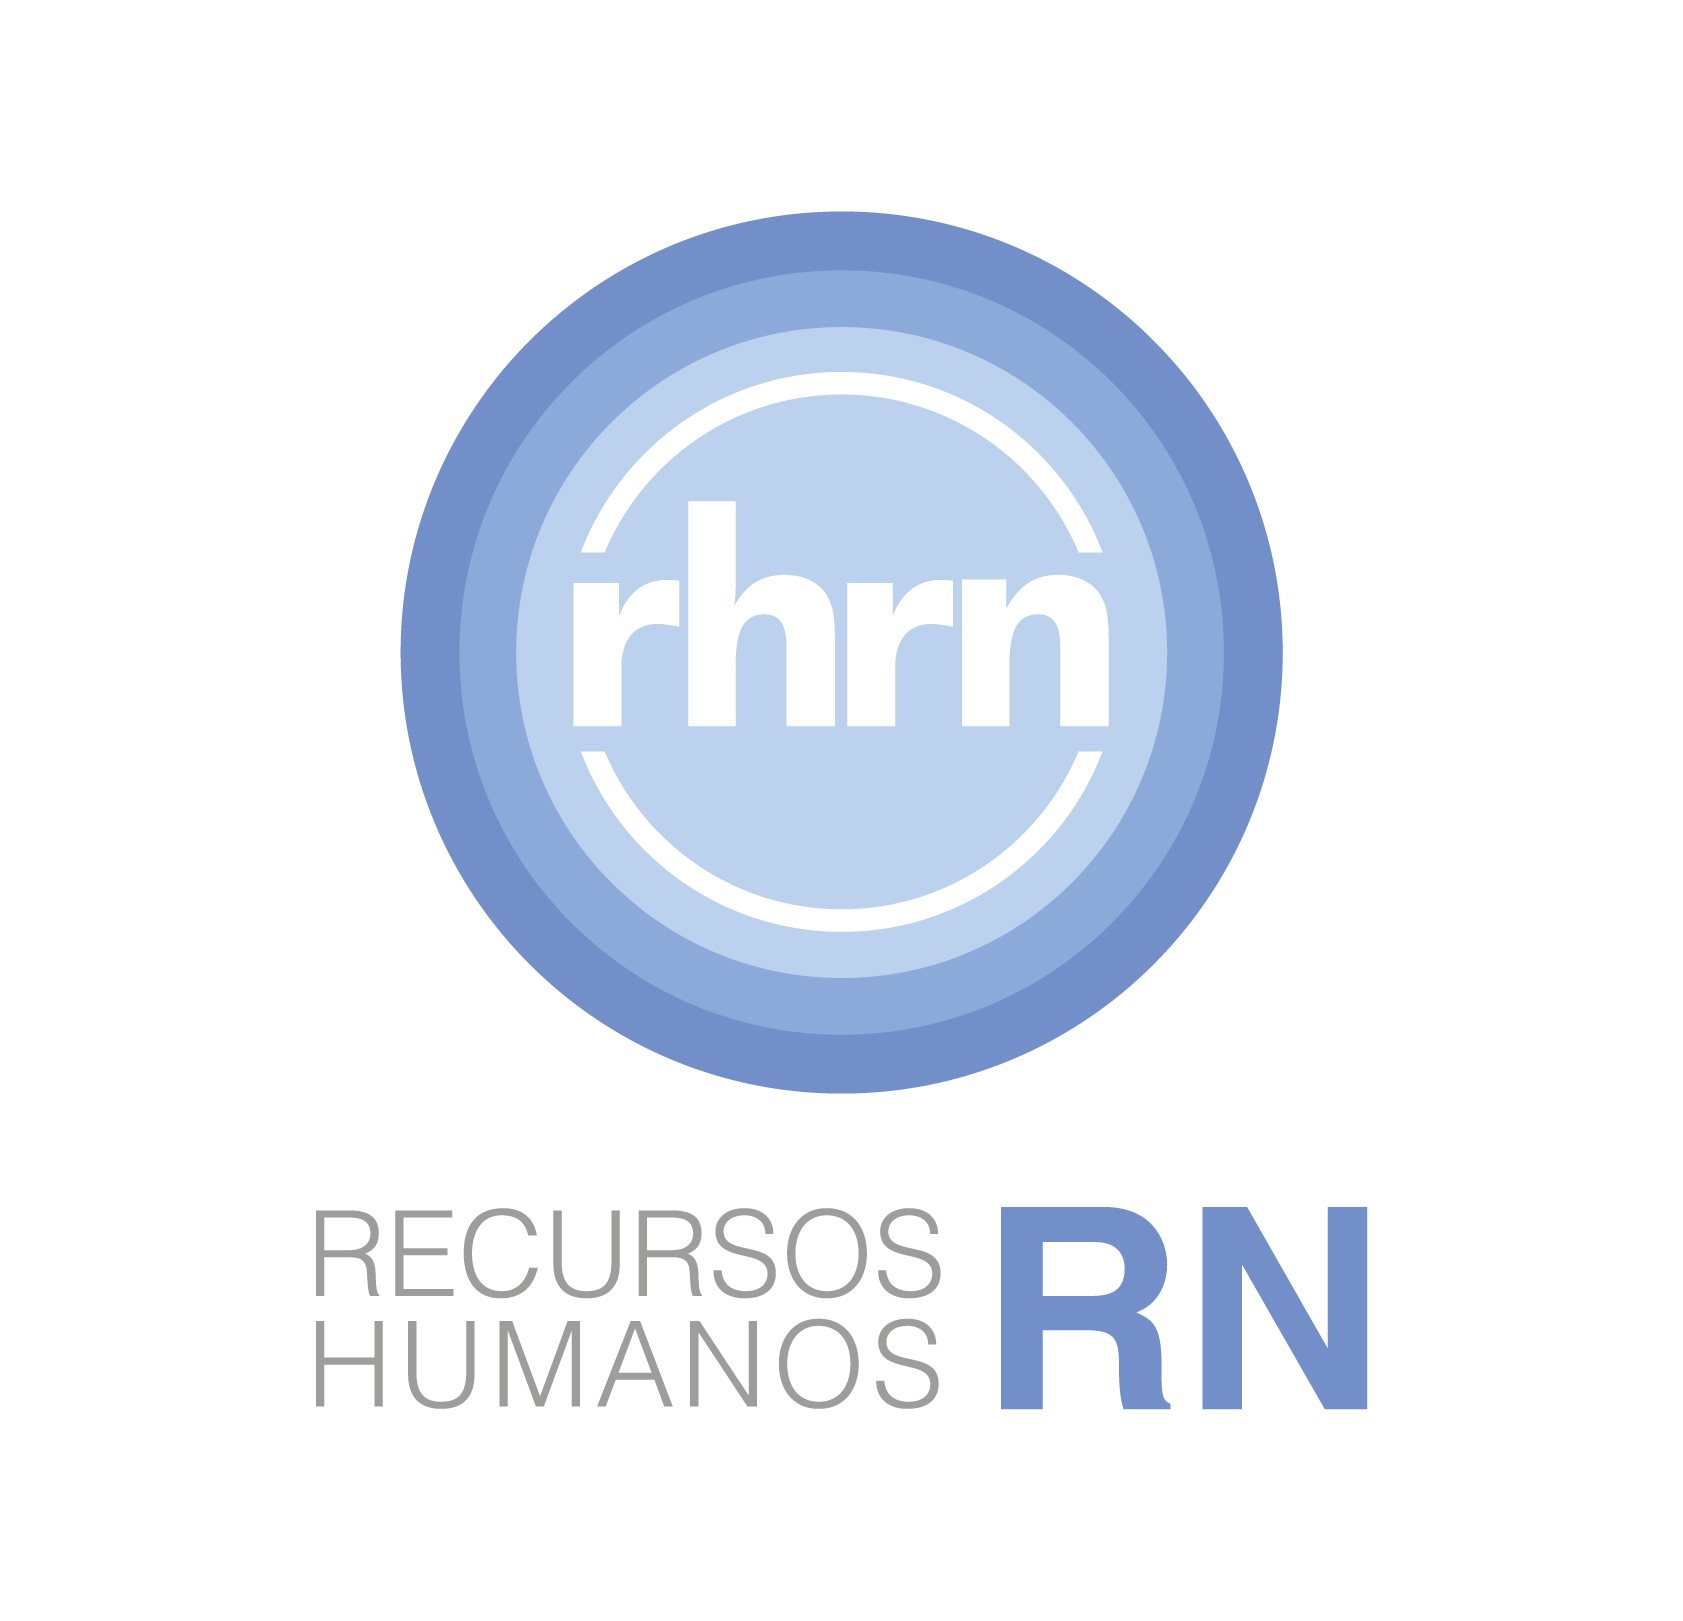 Recursos Humanos RN